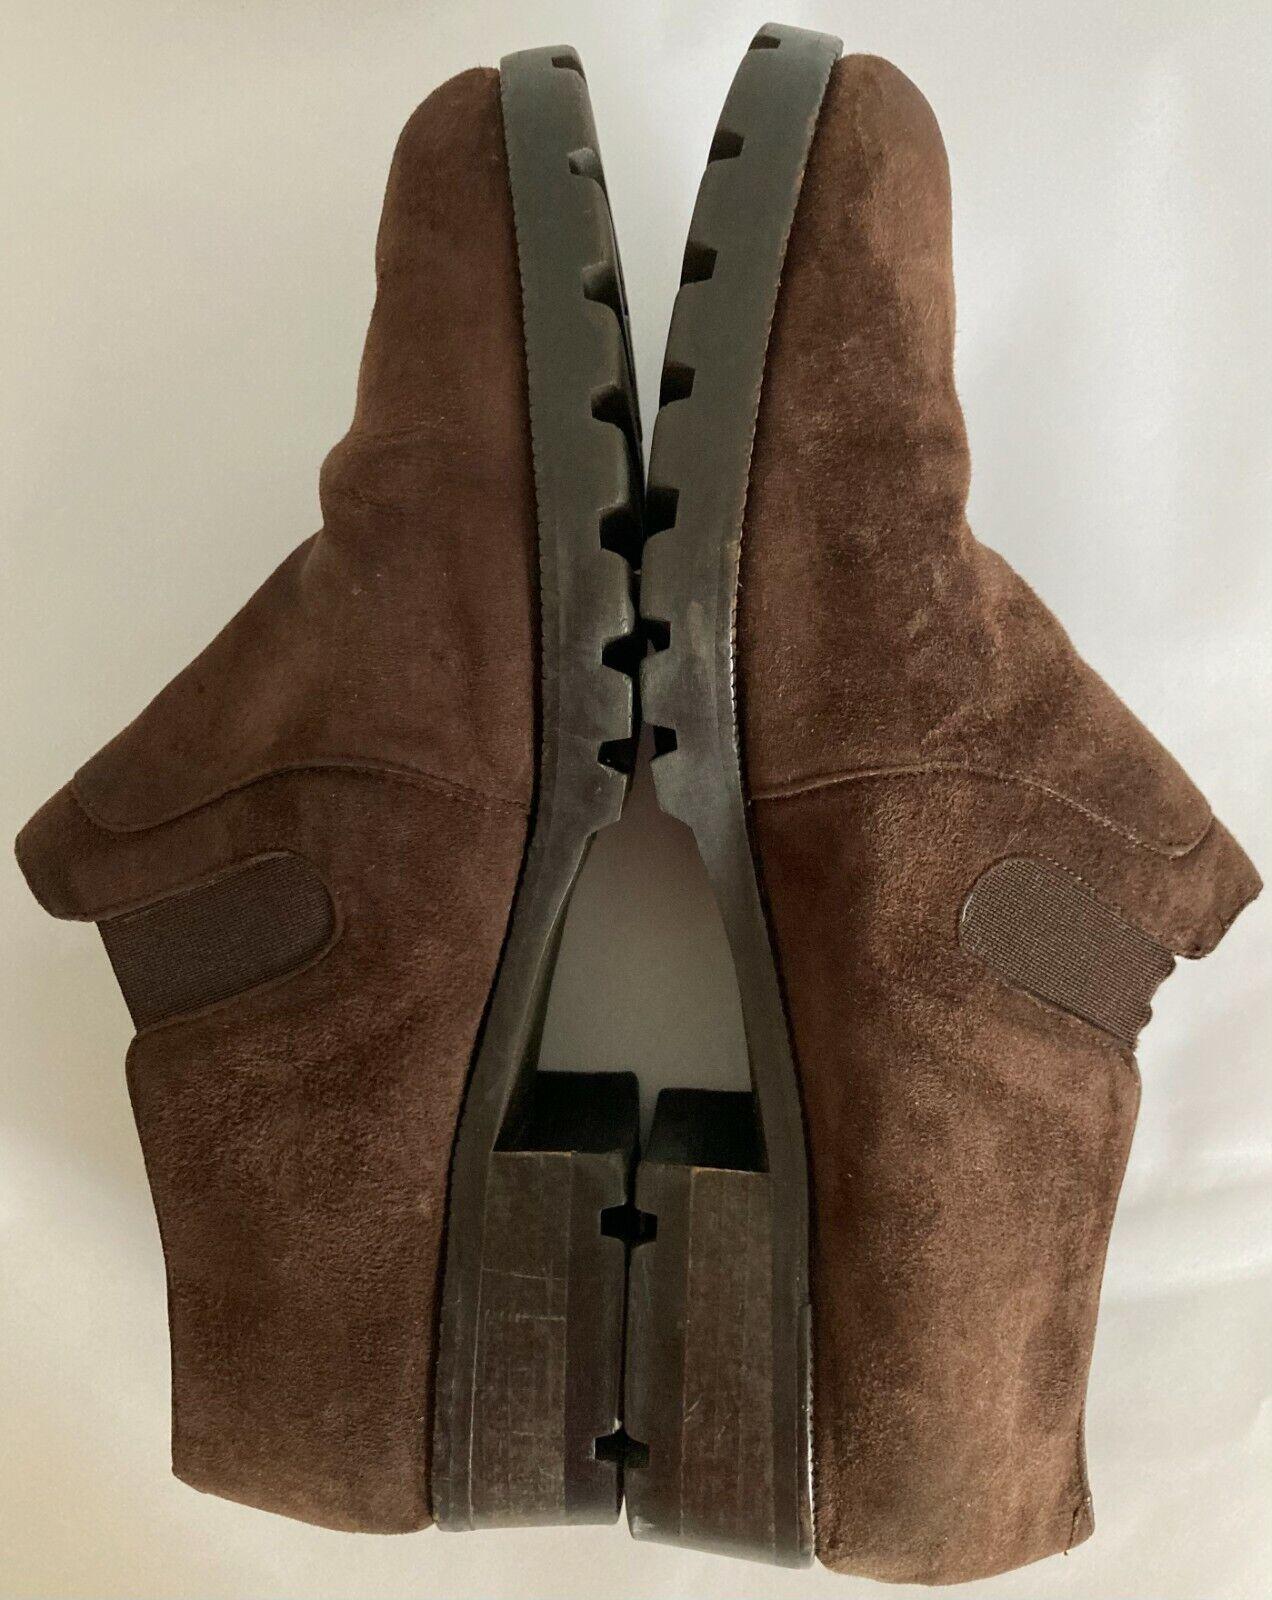 Amalfi Italy Low Heel Slip On Brown Suede Studio Shoes Loafers Women's SZ 7 1/2